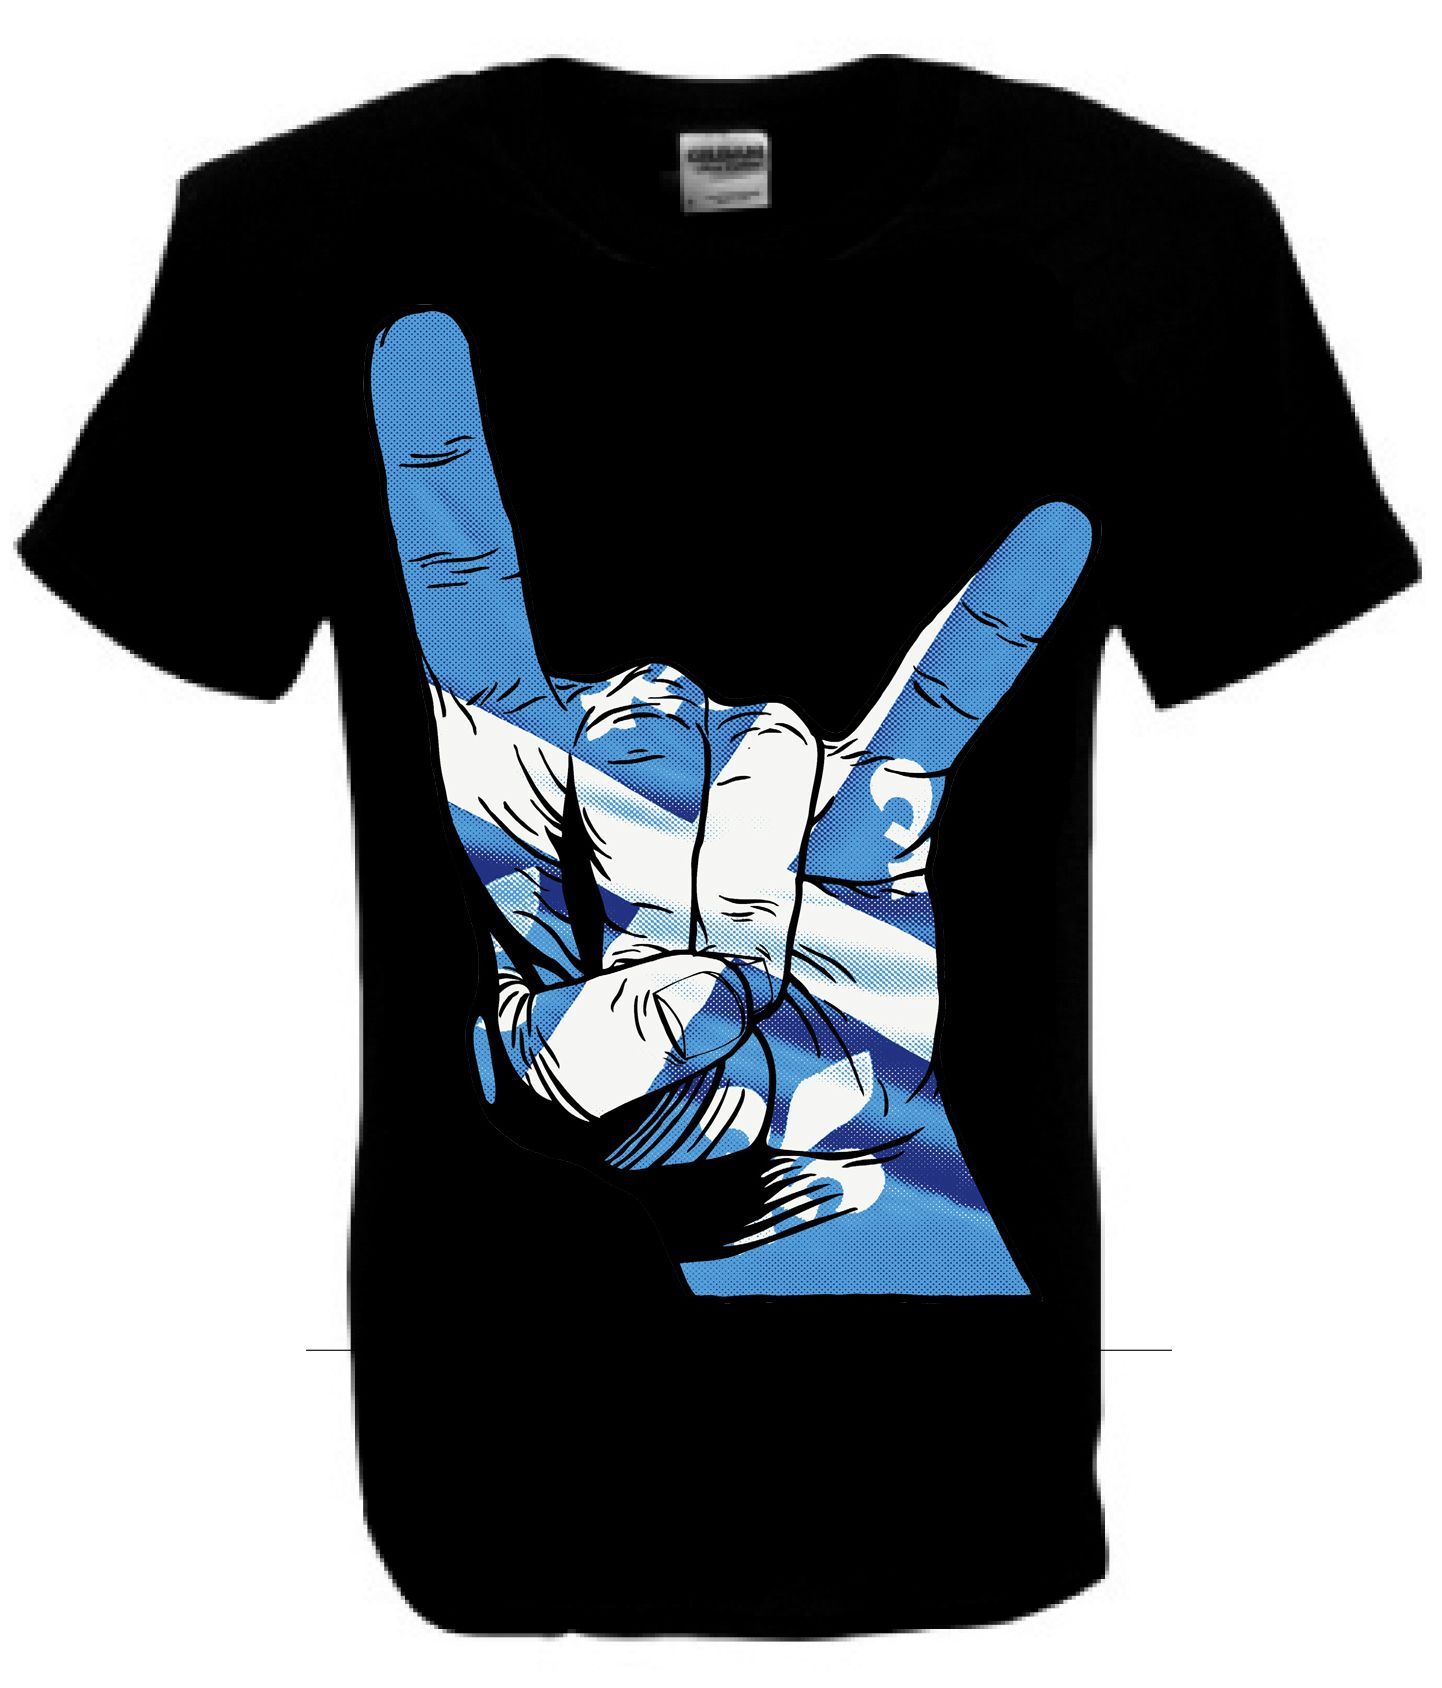 Quebec Flag Black Horns T-Shirt